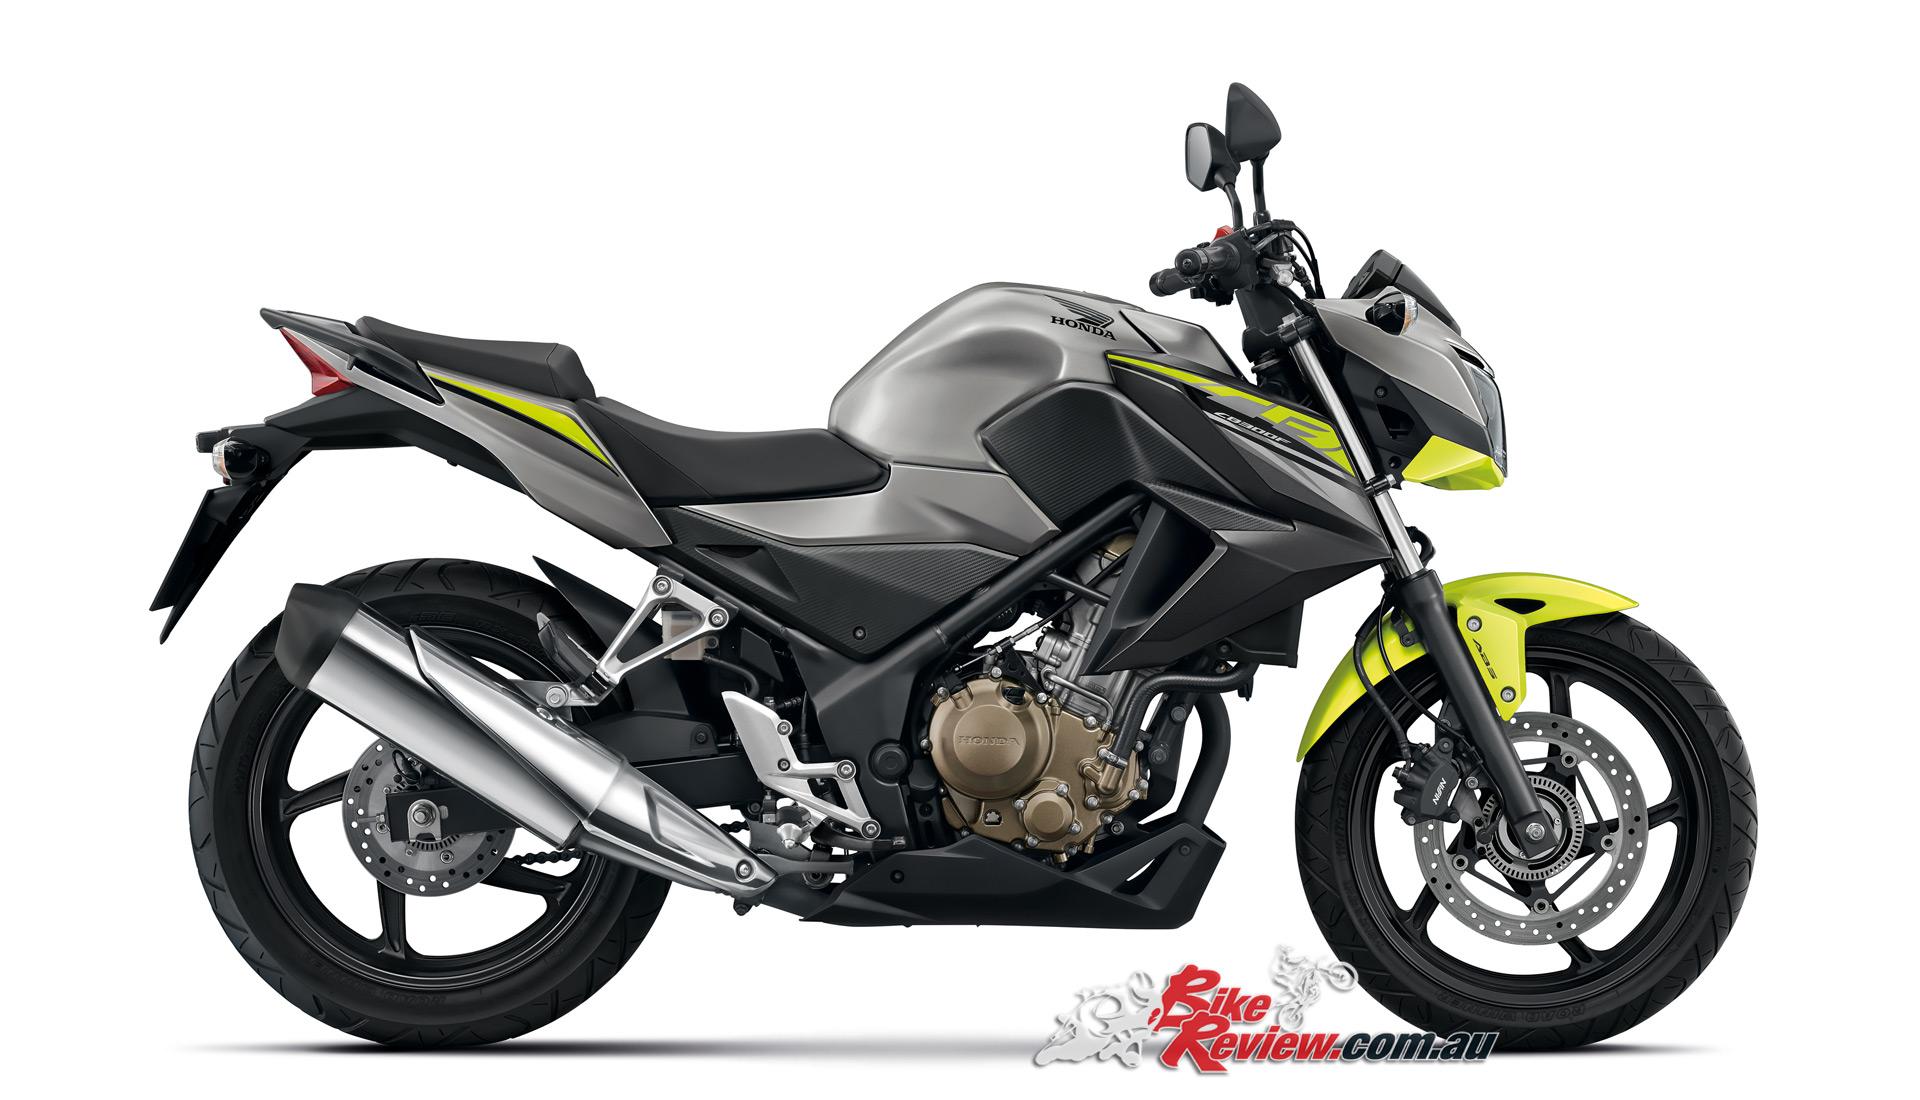 2017 Honda CB300F ABS Review